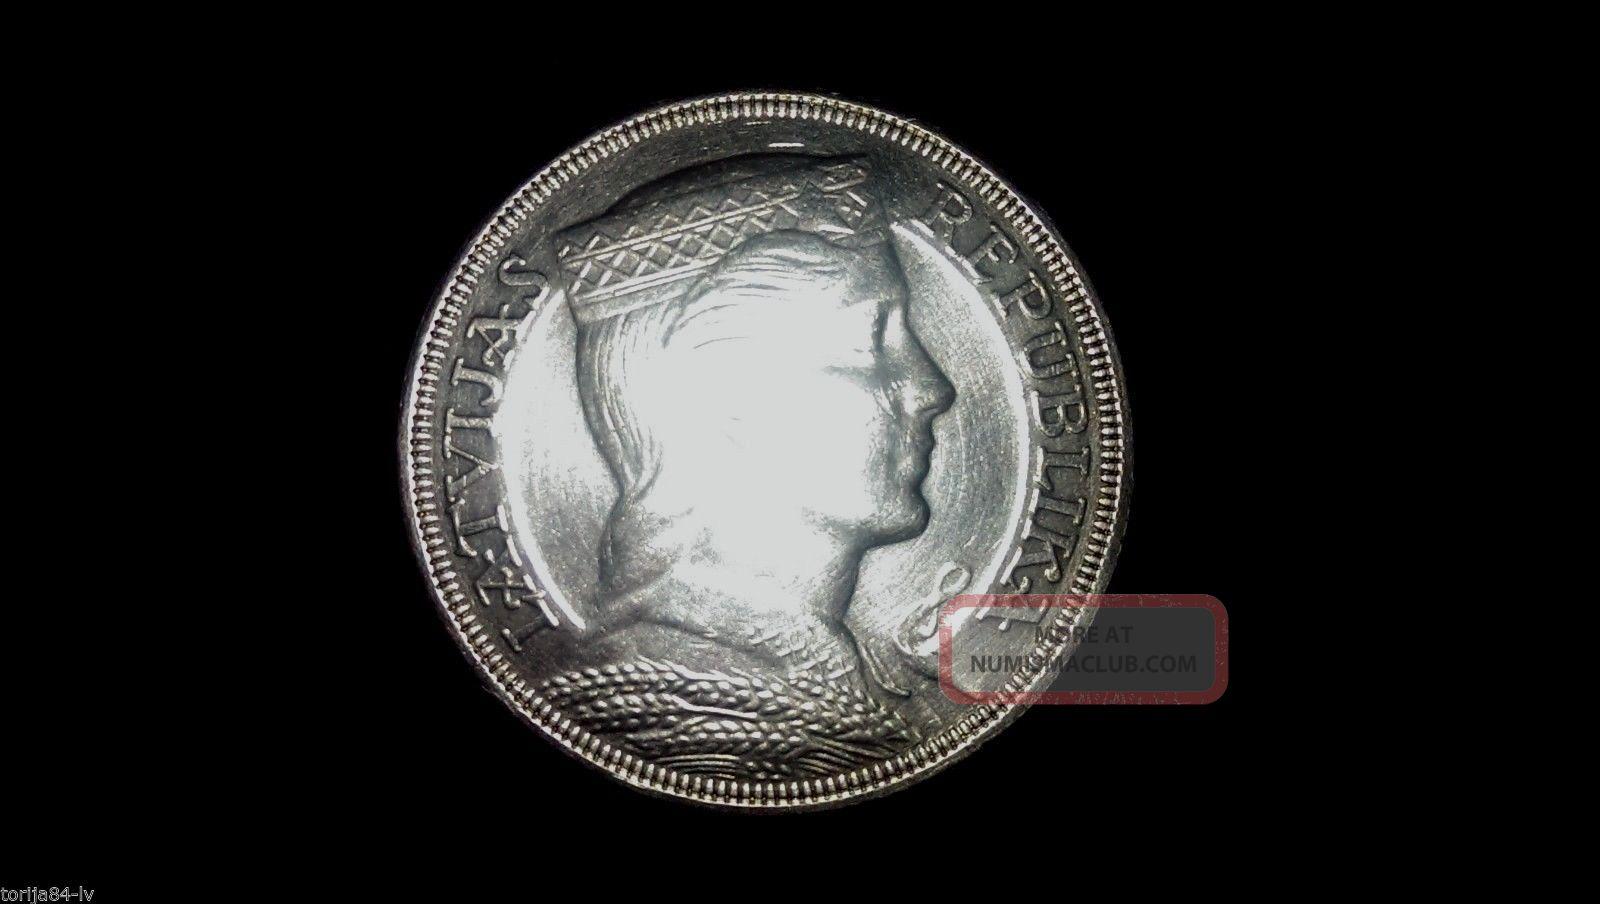 1931 - Silver 5 Lats,  Ms Very Rare Latvian Silver Coin Europe photo